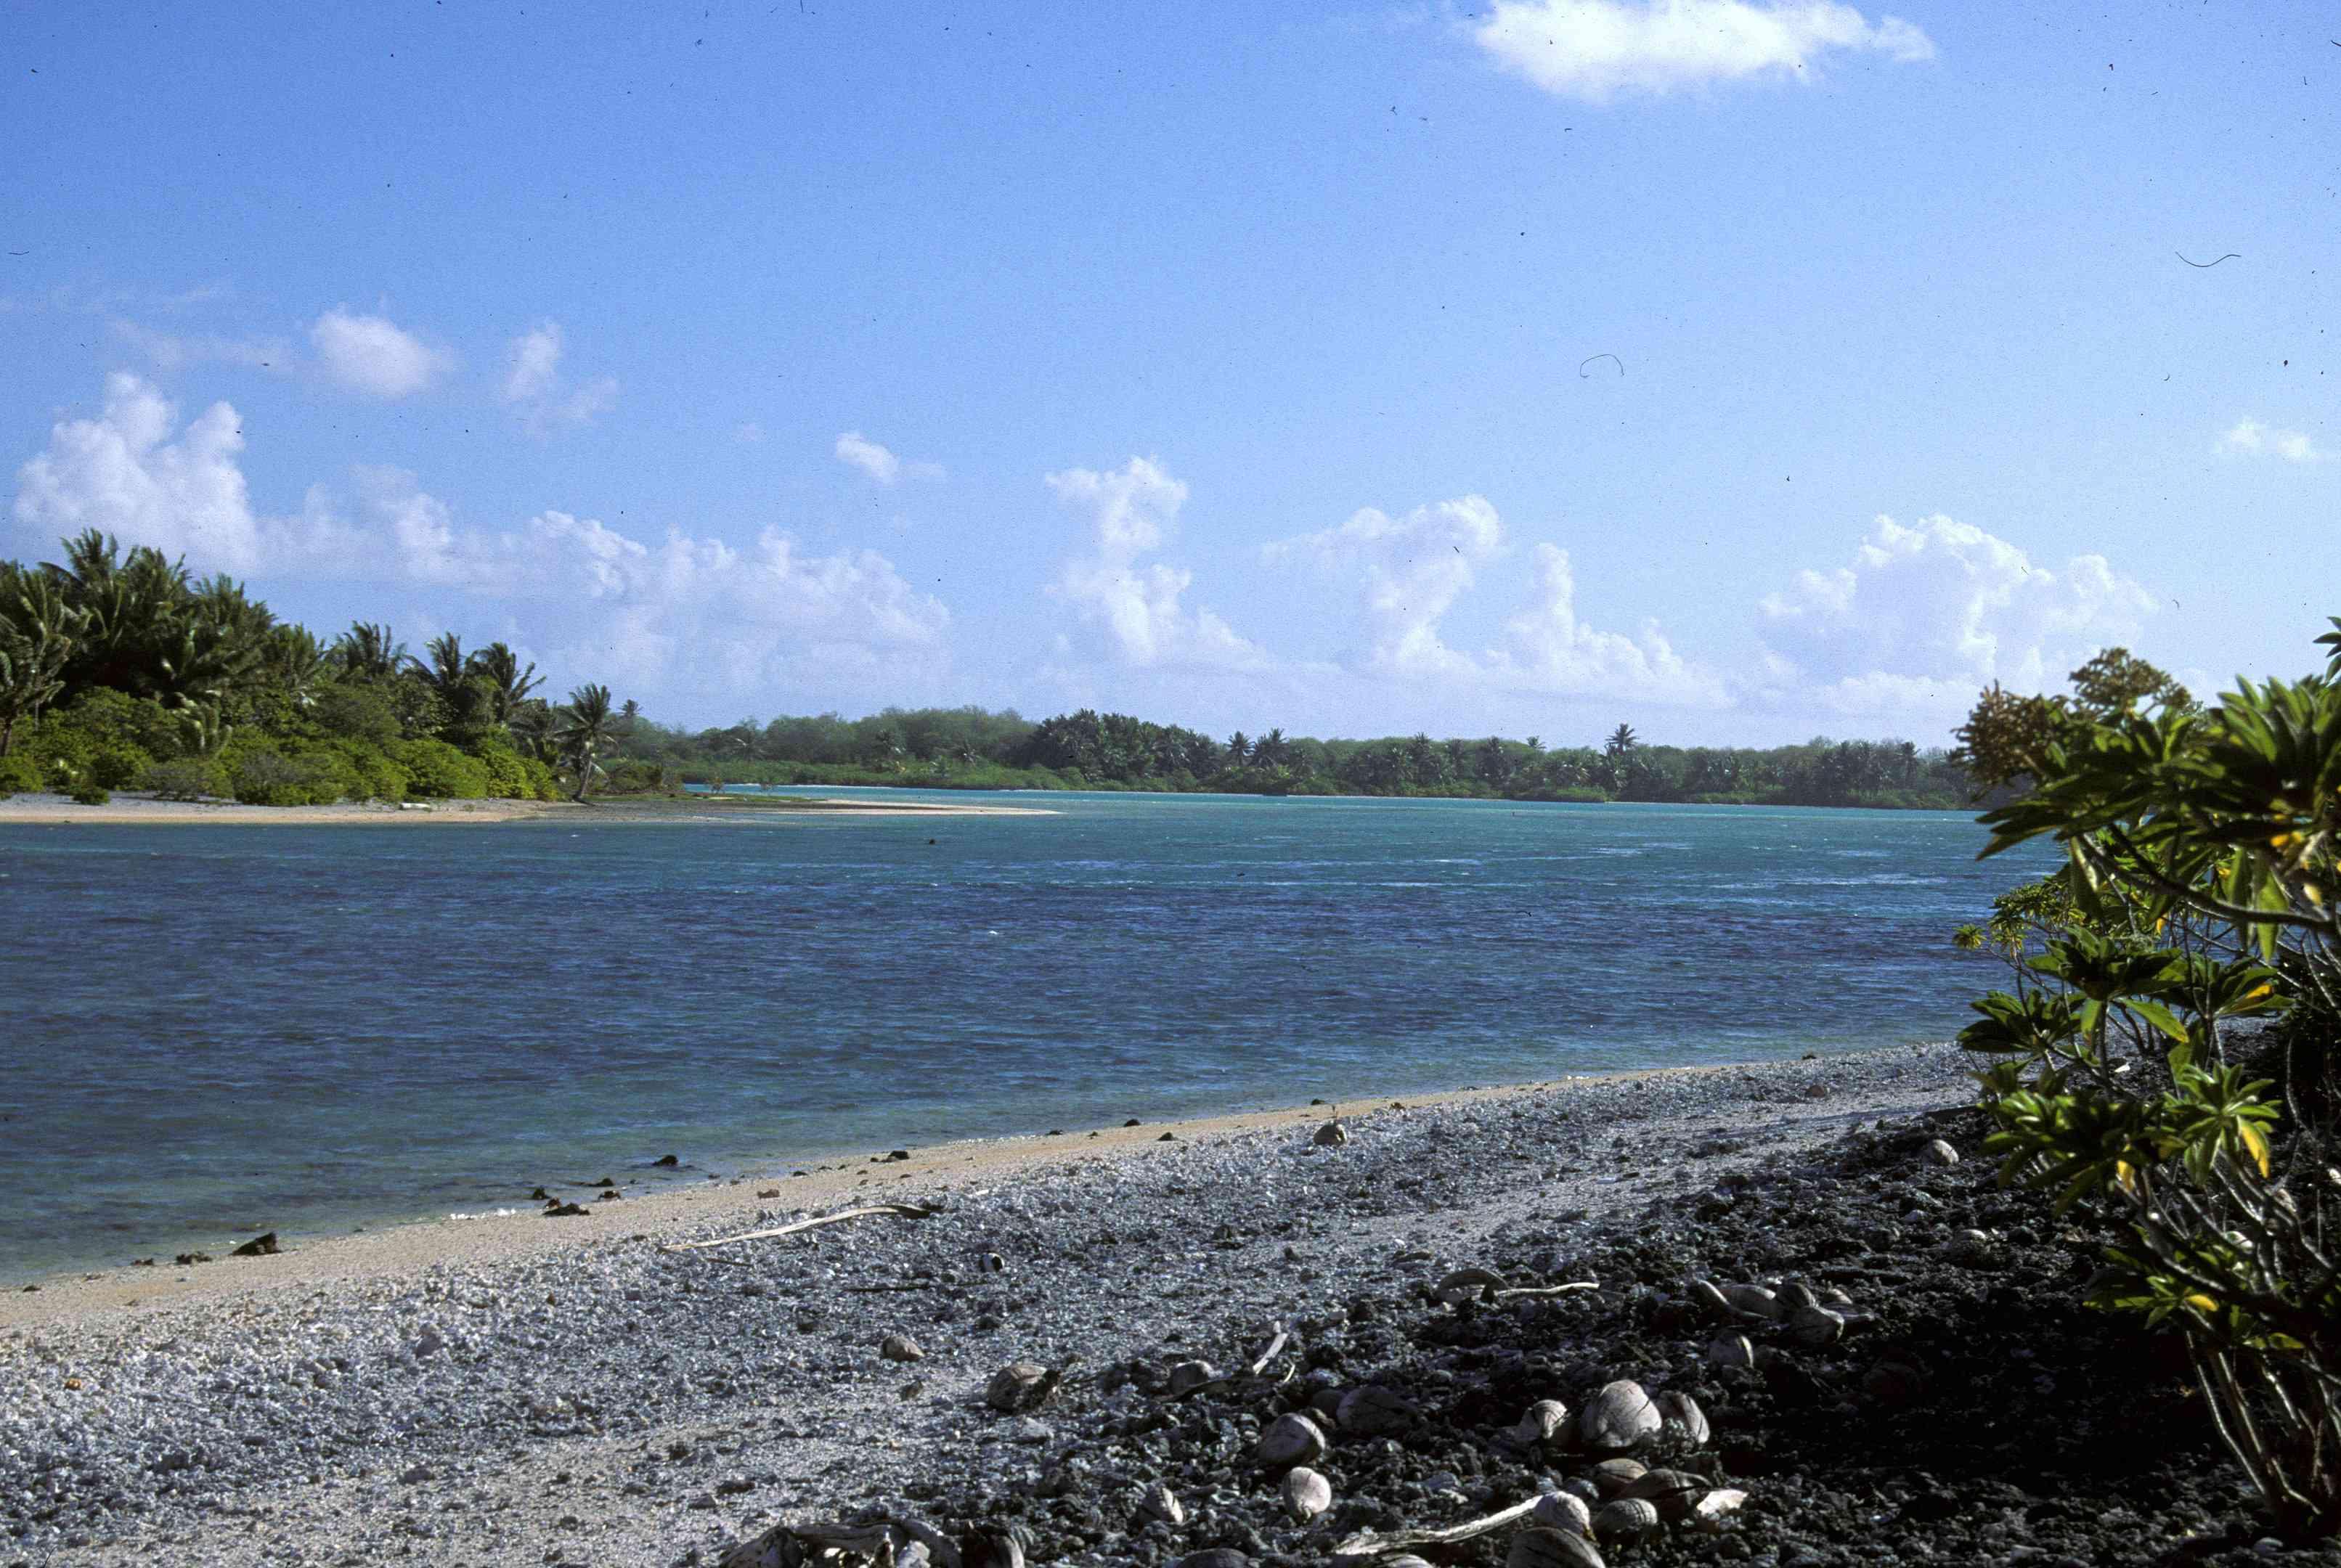 Tatiman Passage in the northwest of the Atoll is the only navigable entrance into the lagoon of Nikumaroro, Phoenix Islands, Kiribati.